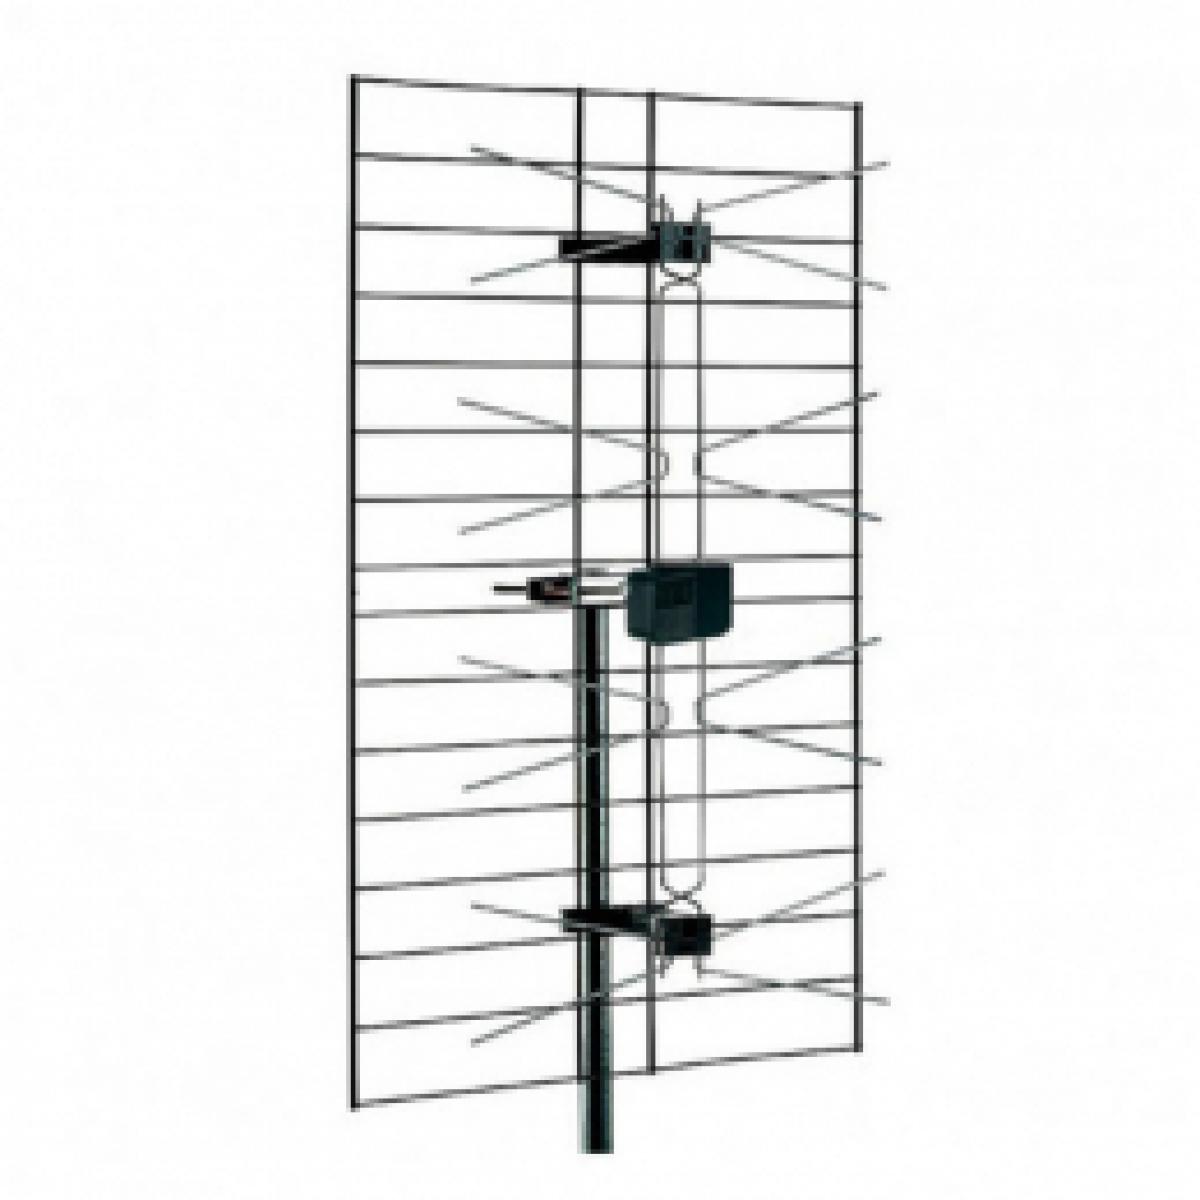 Antenna a pannello pu4af lte banda uhf e21-e69 217452 fracarro